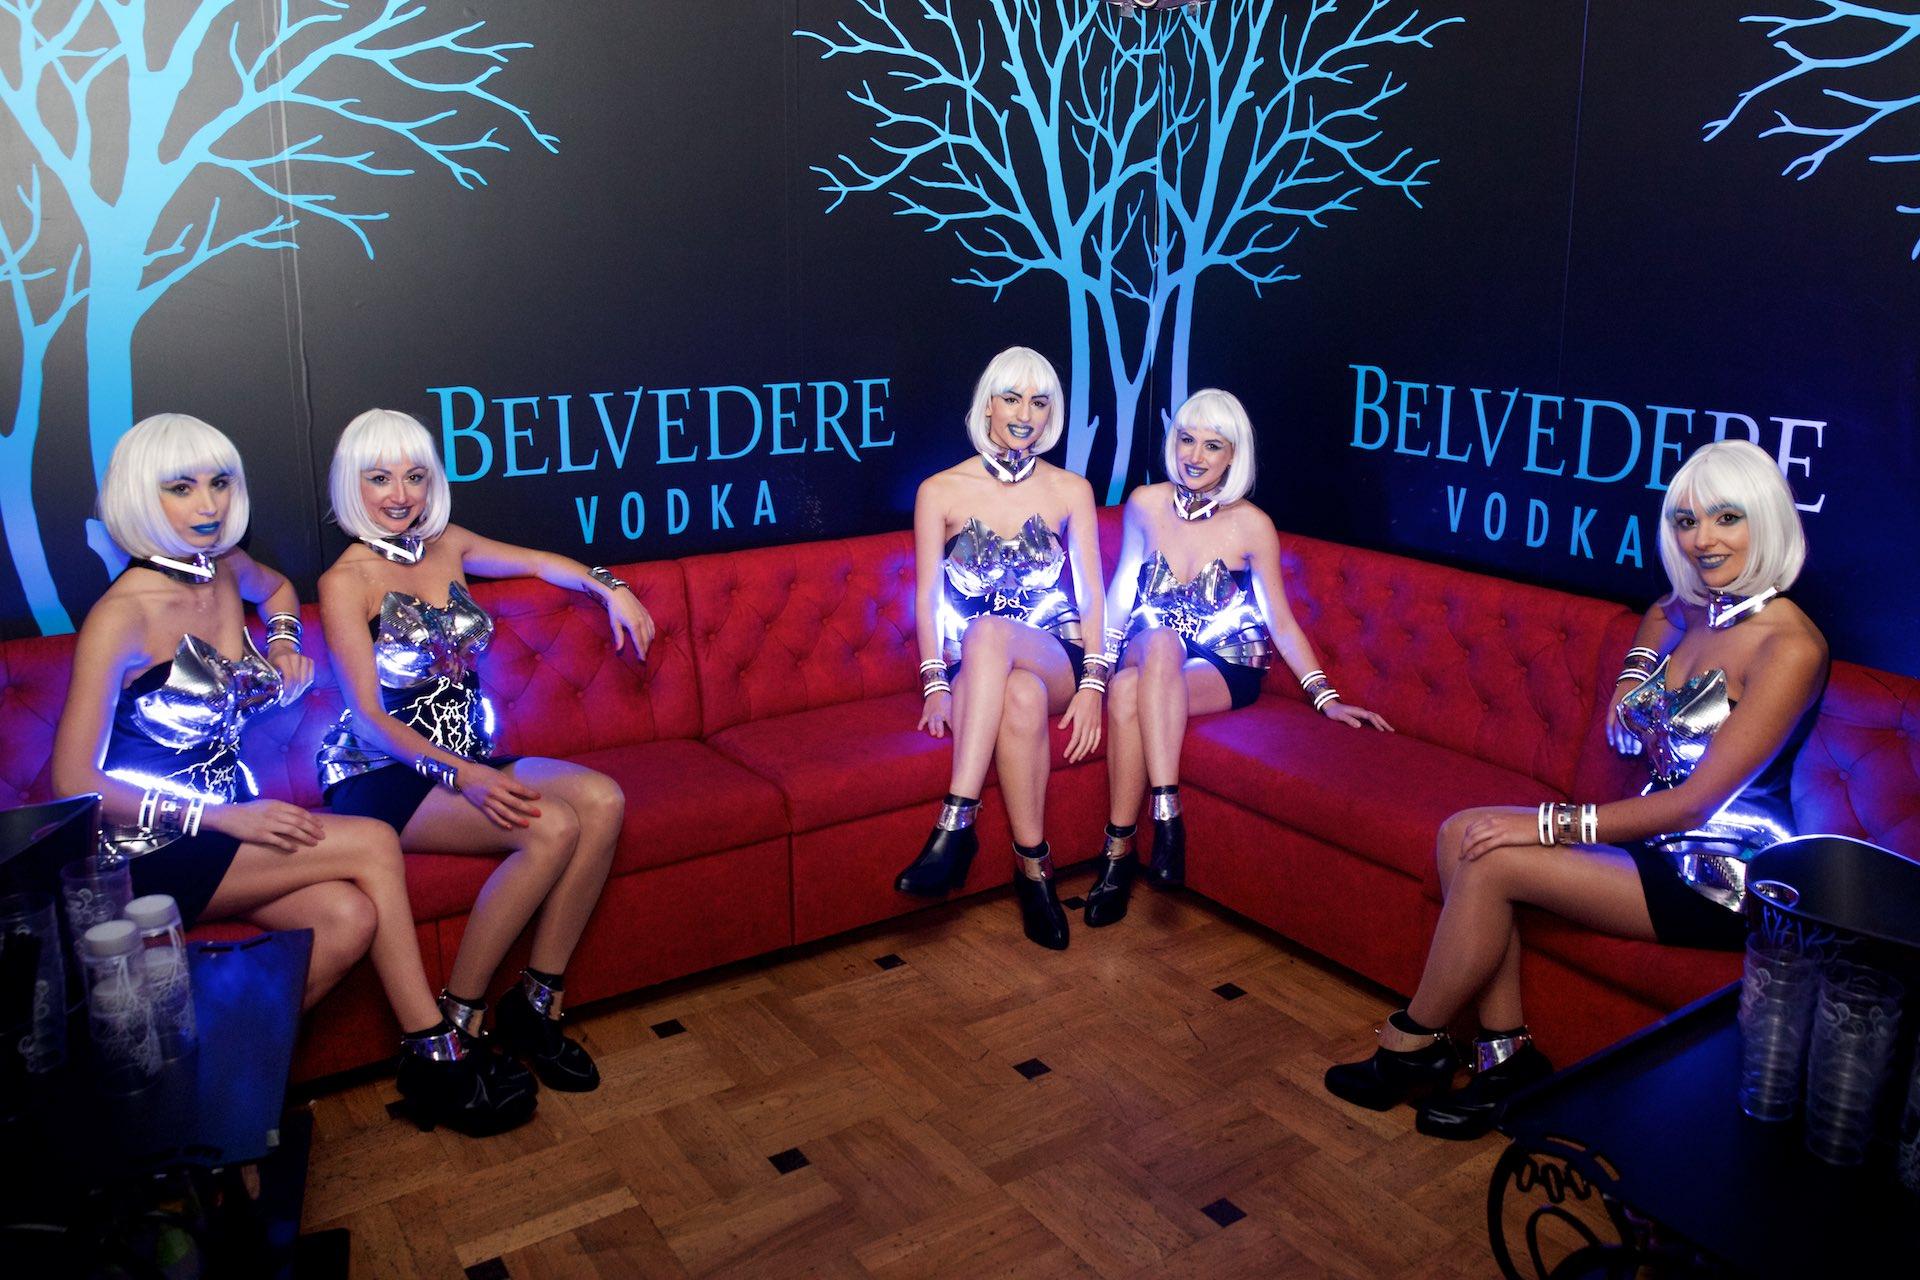 BELVEDERE_VODKA_170326_0050